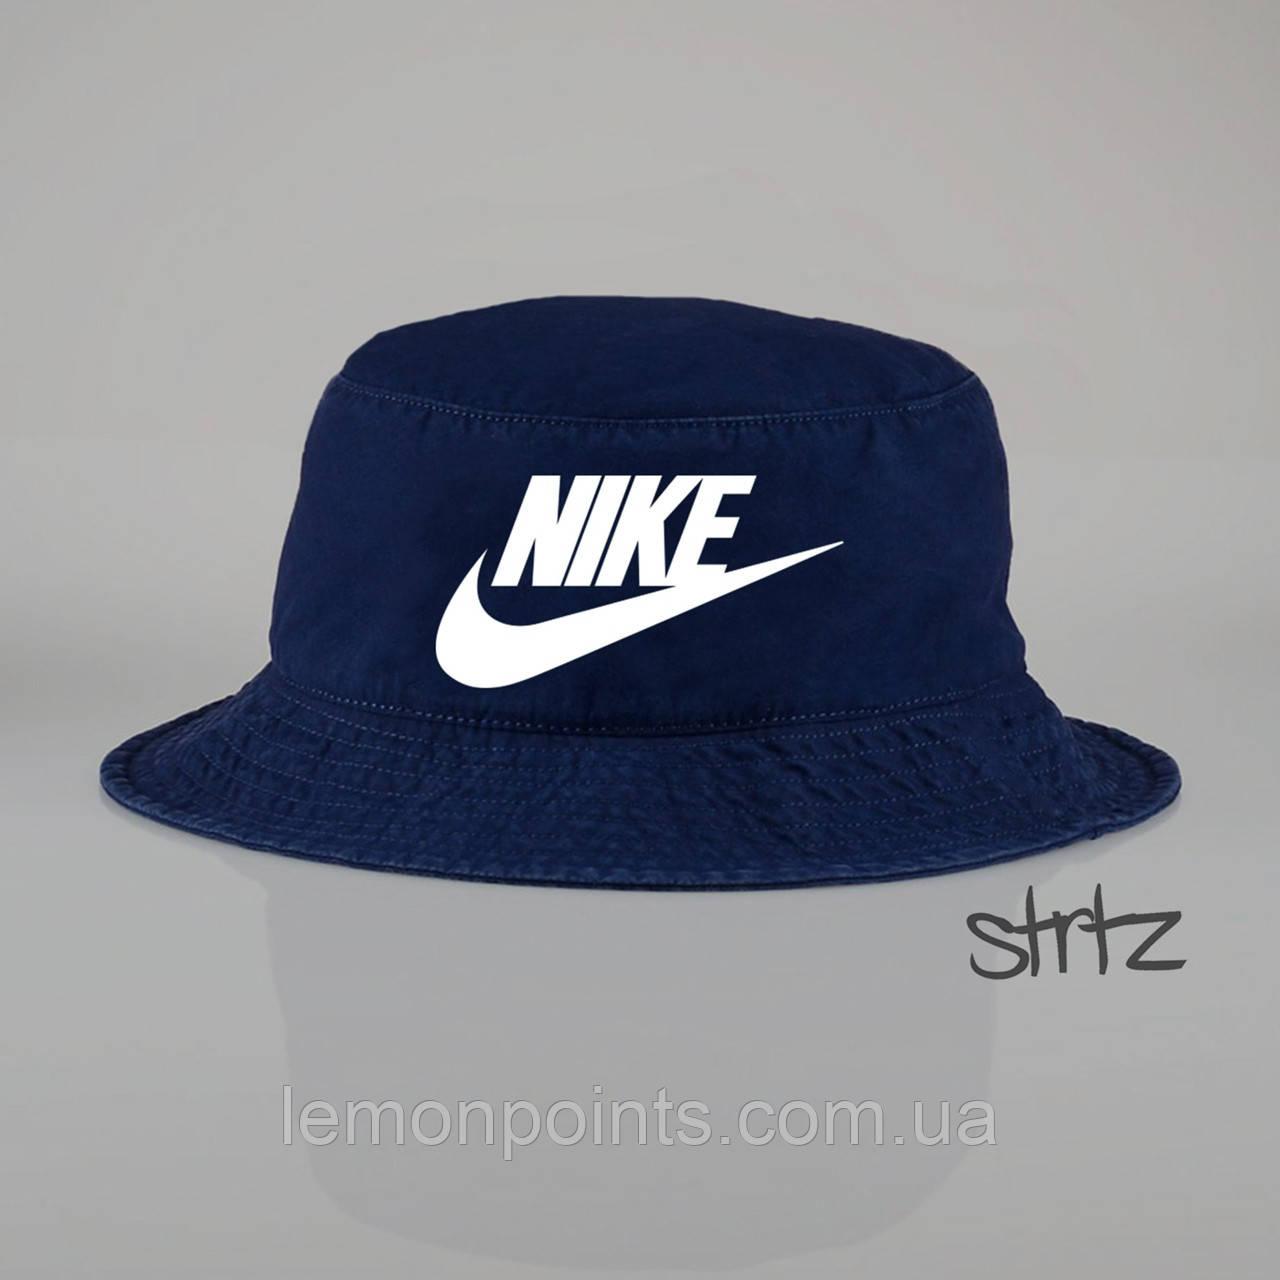 Панамка Nike   летняя хлопковая синяя